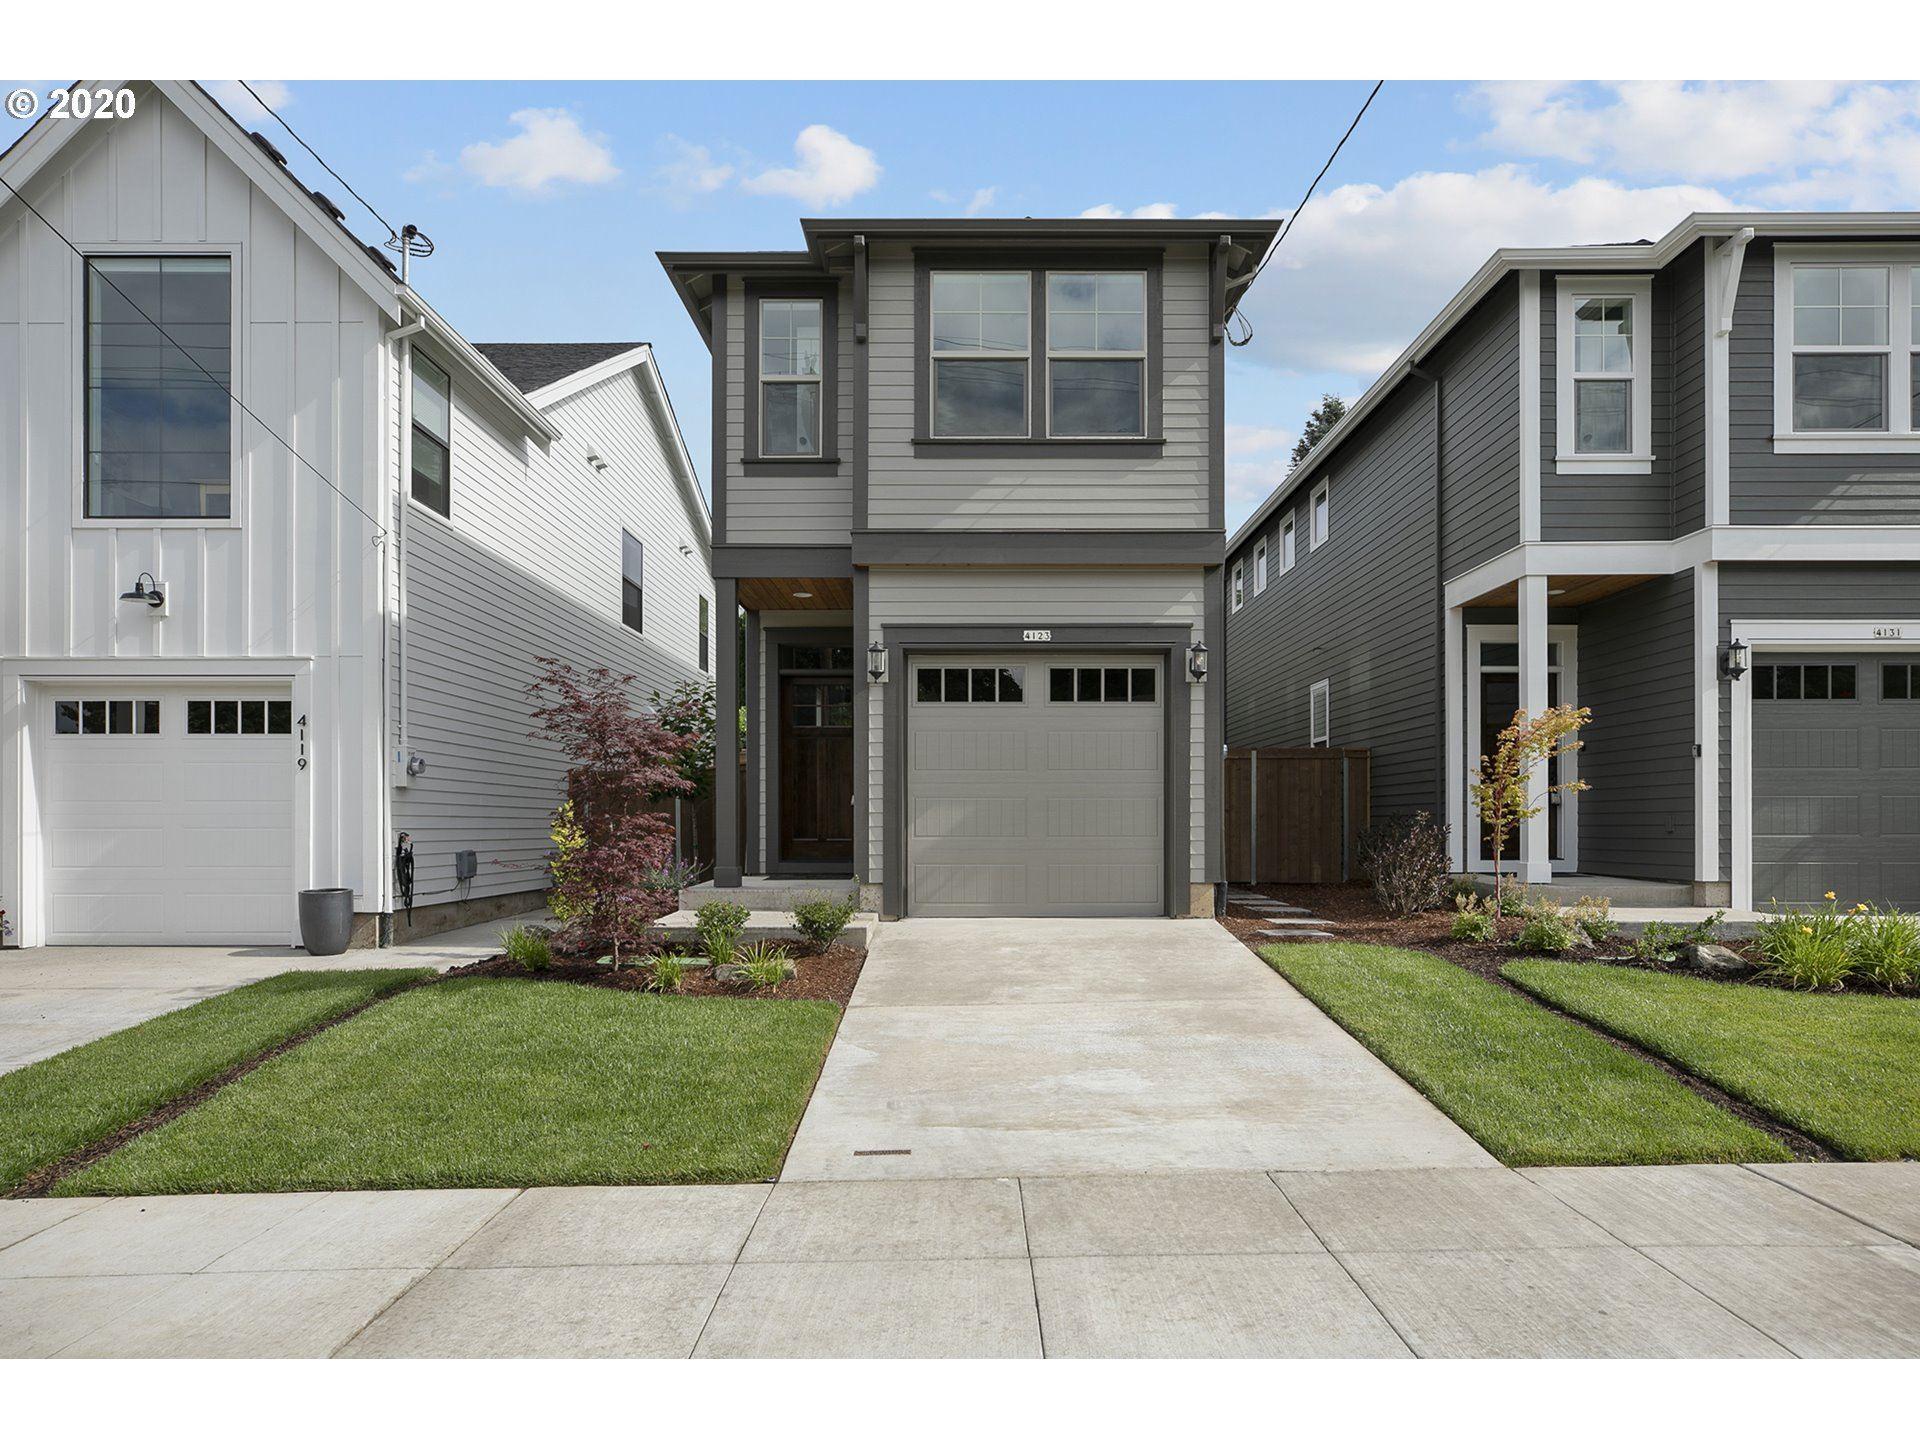 4123 SE BYBEE BLVD, Portland, OR 97202 - MLS#: 20467347